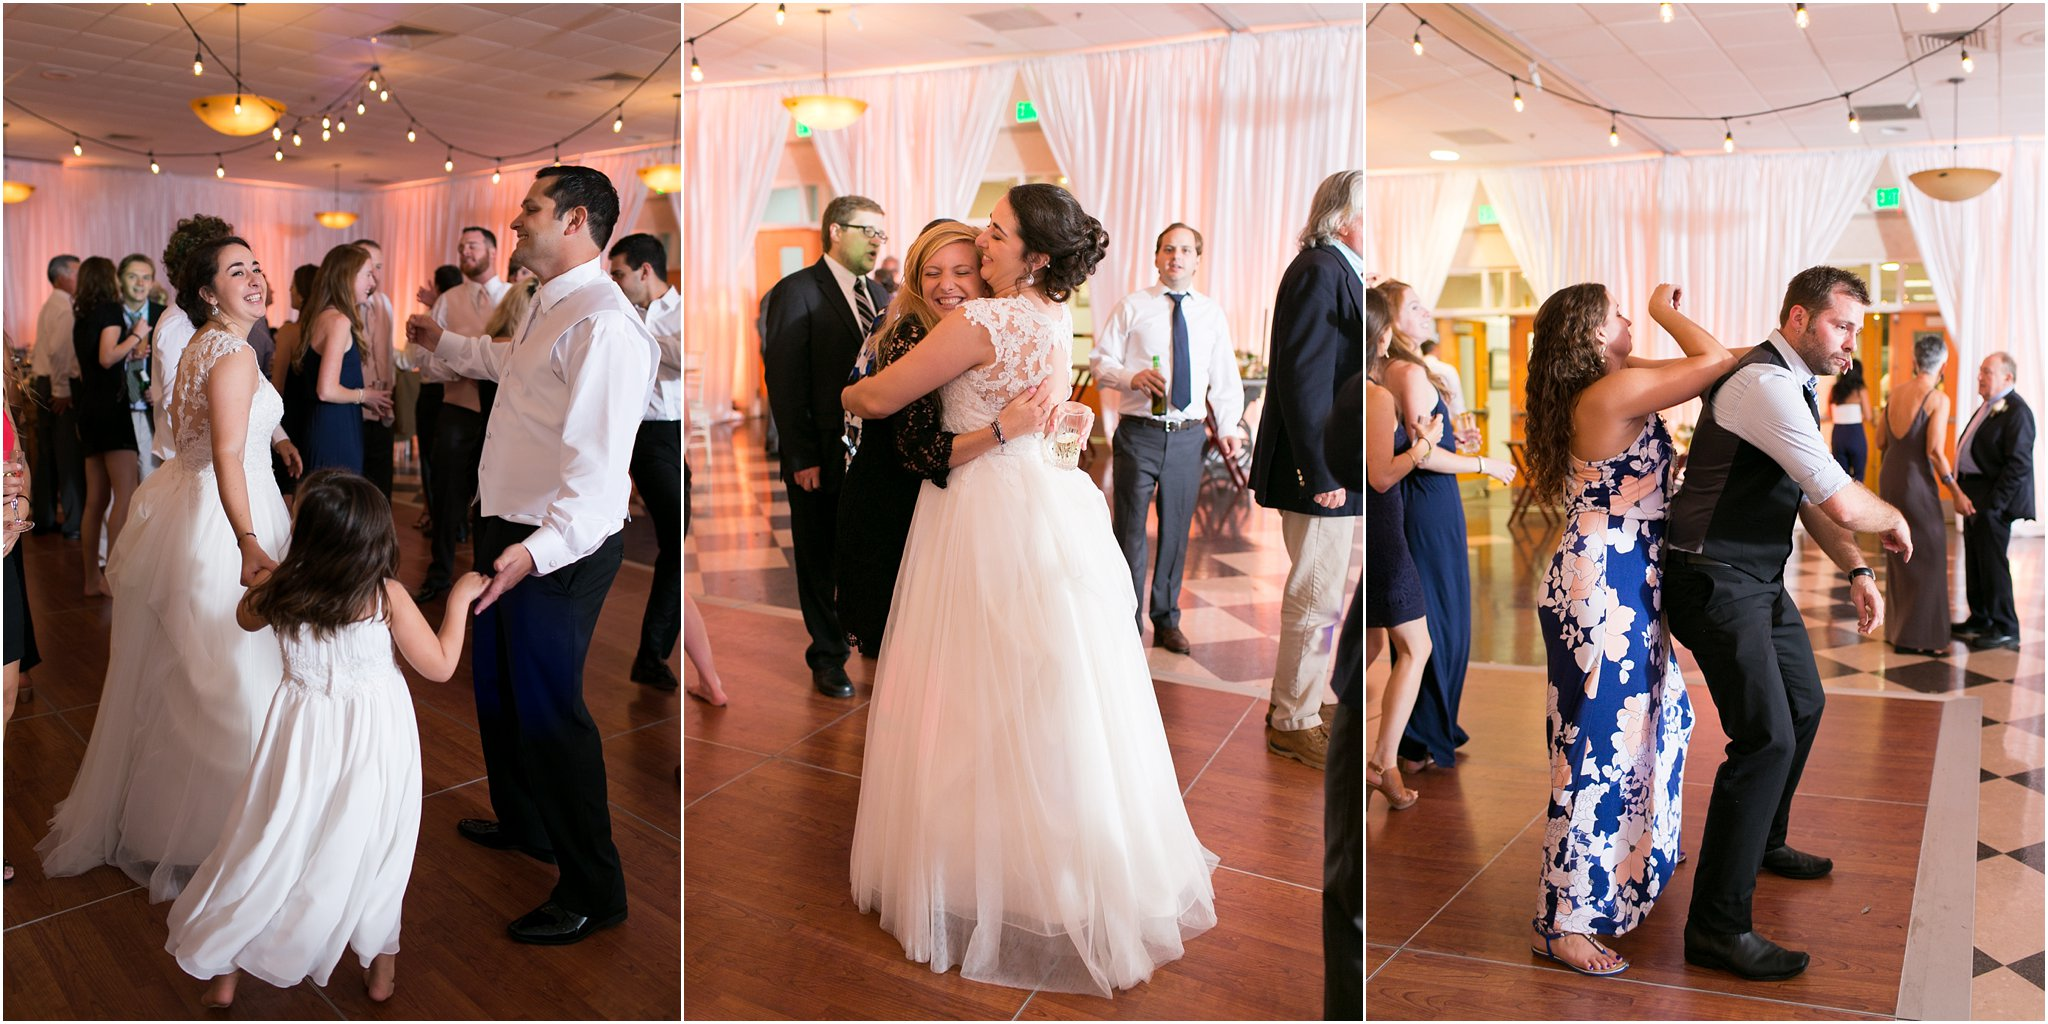 jessica_ryan_photography_virginia_wedding_photographer_wedding_hurricane_norfolk_botanical_gardens_hurricane_matthew_wedding_3644